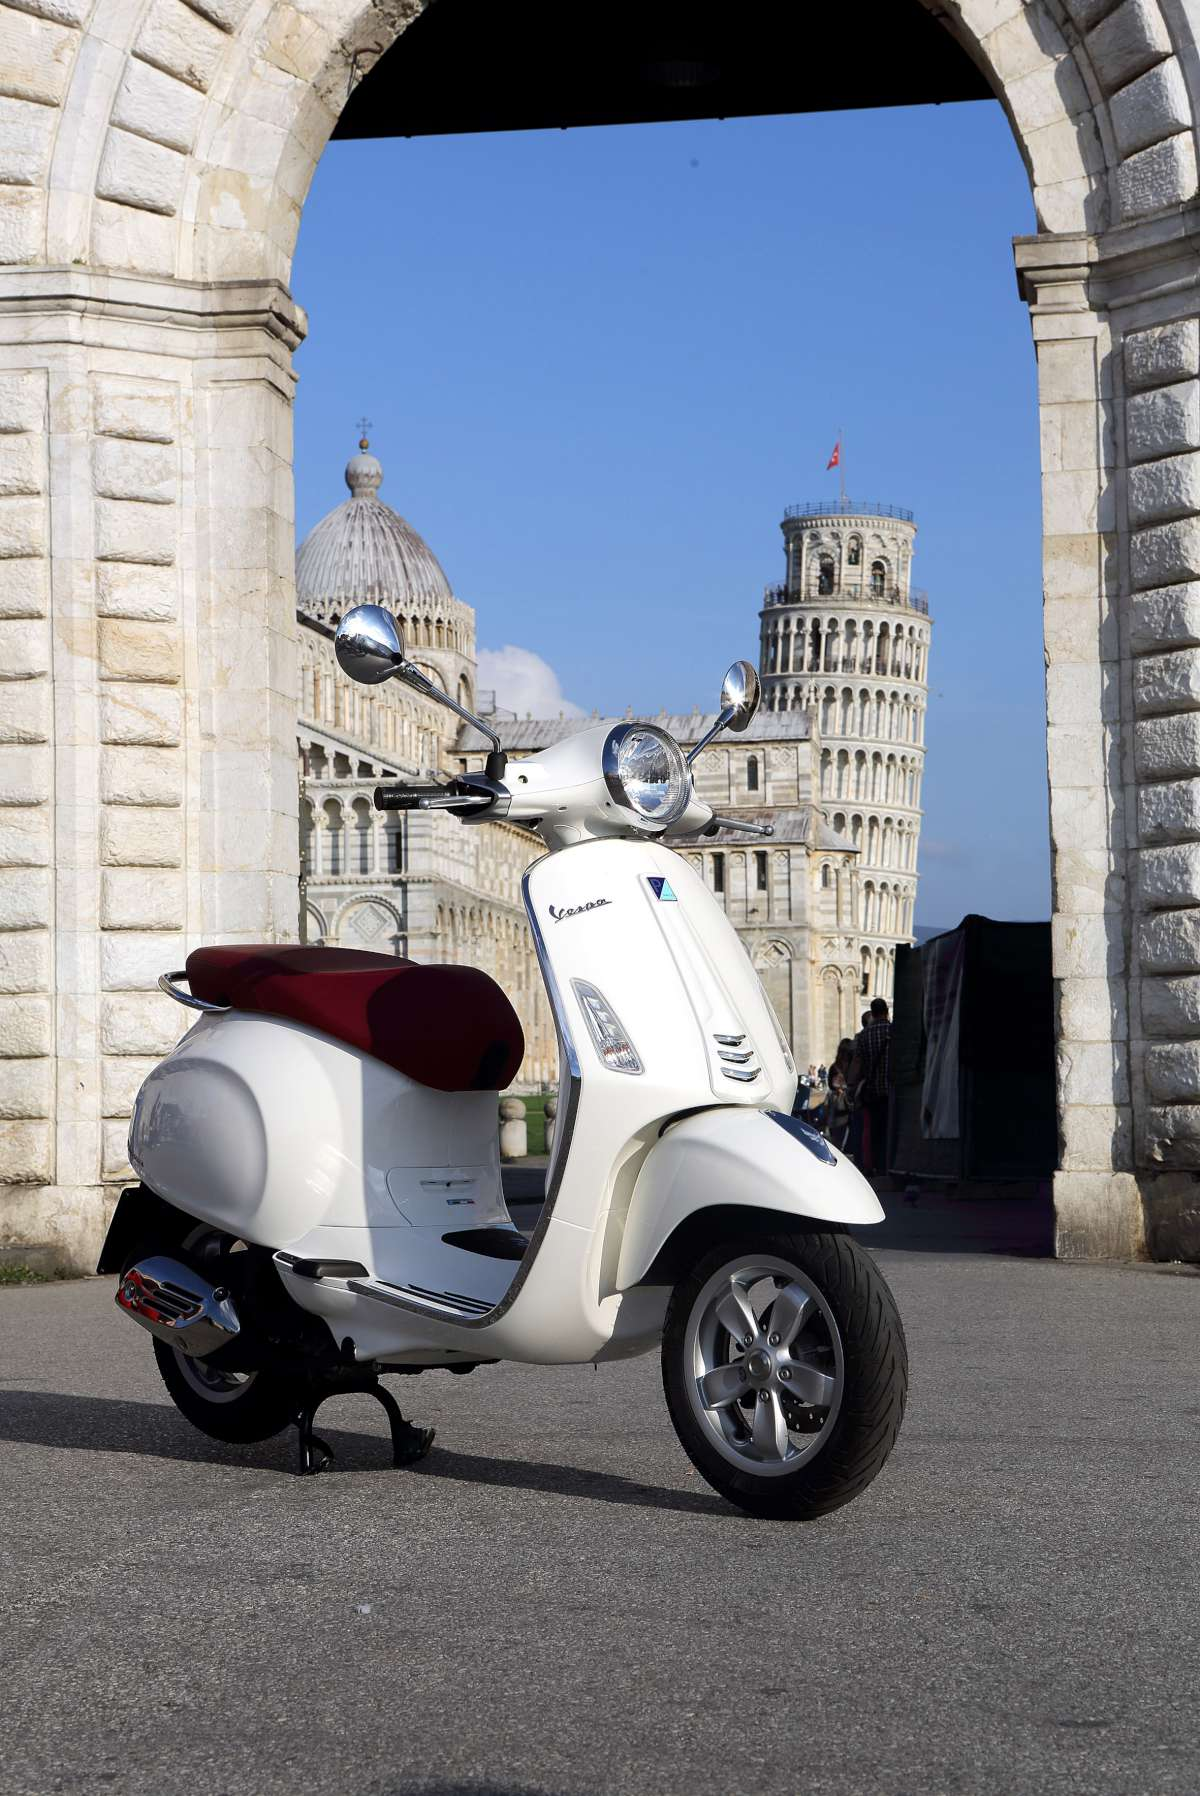 049-Vespa-Primavera-W1200